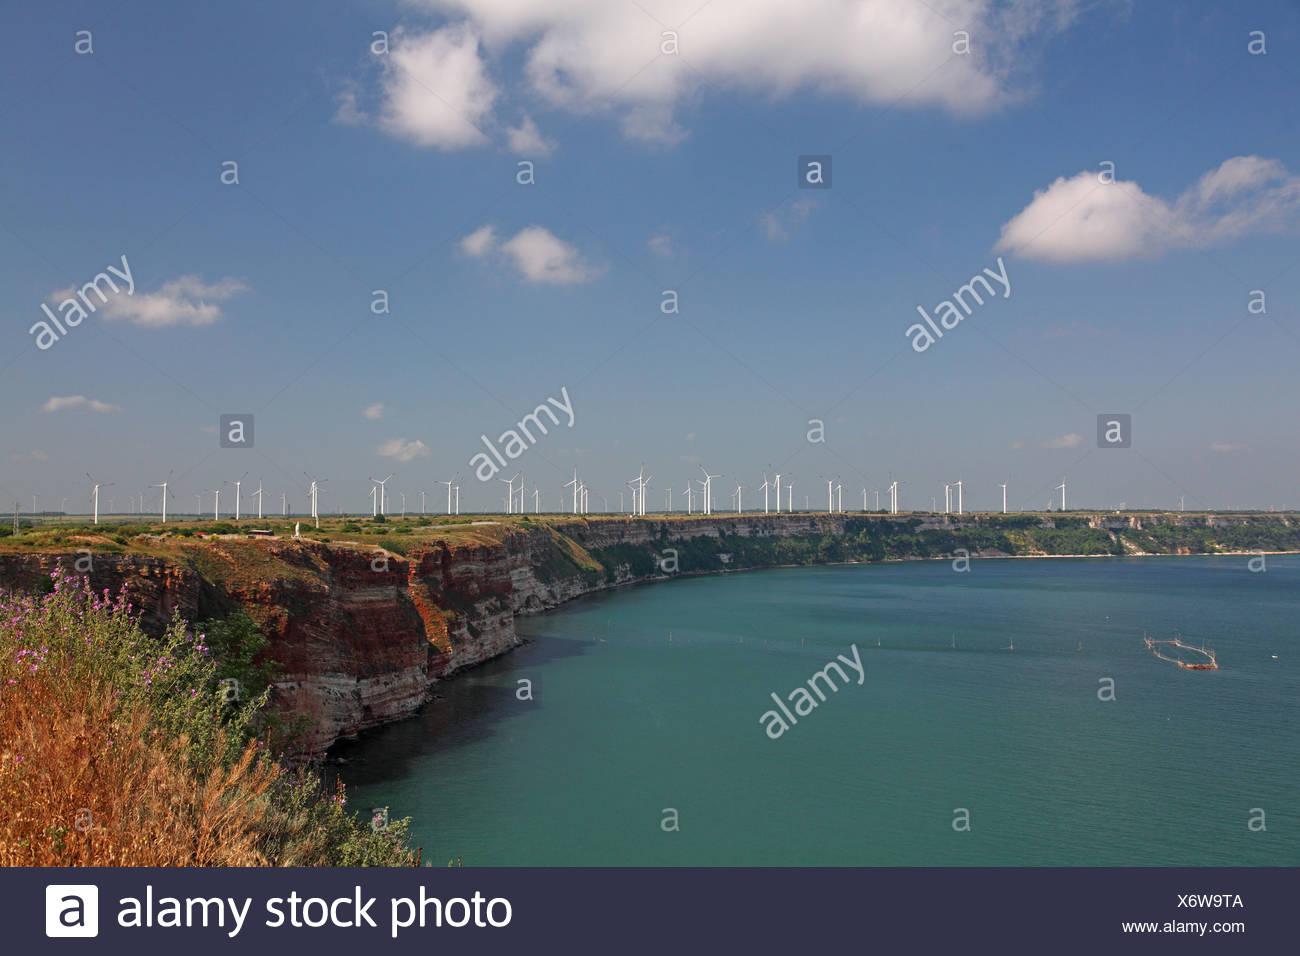 wind power stations near the cliff line, Bulgaria, Kap Kaliakra - Stock Image